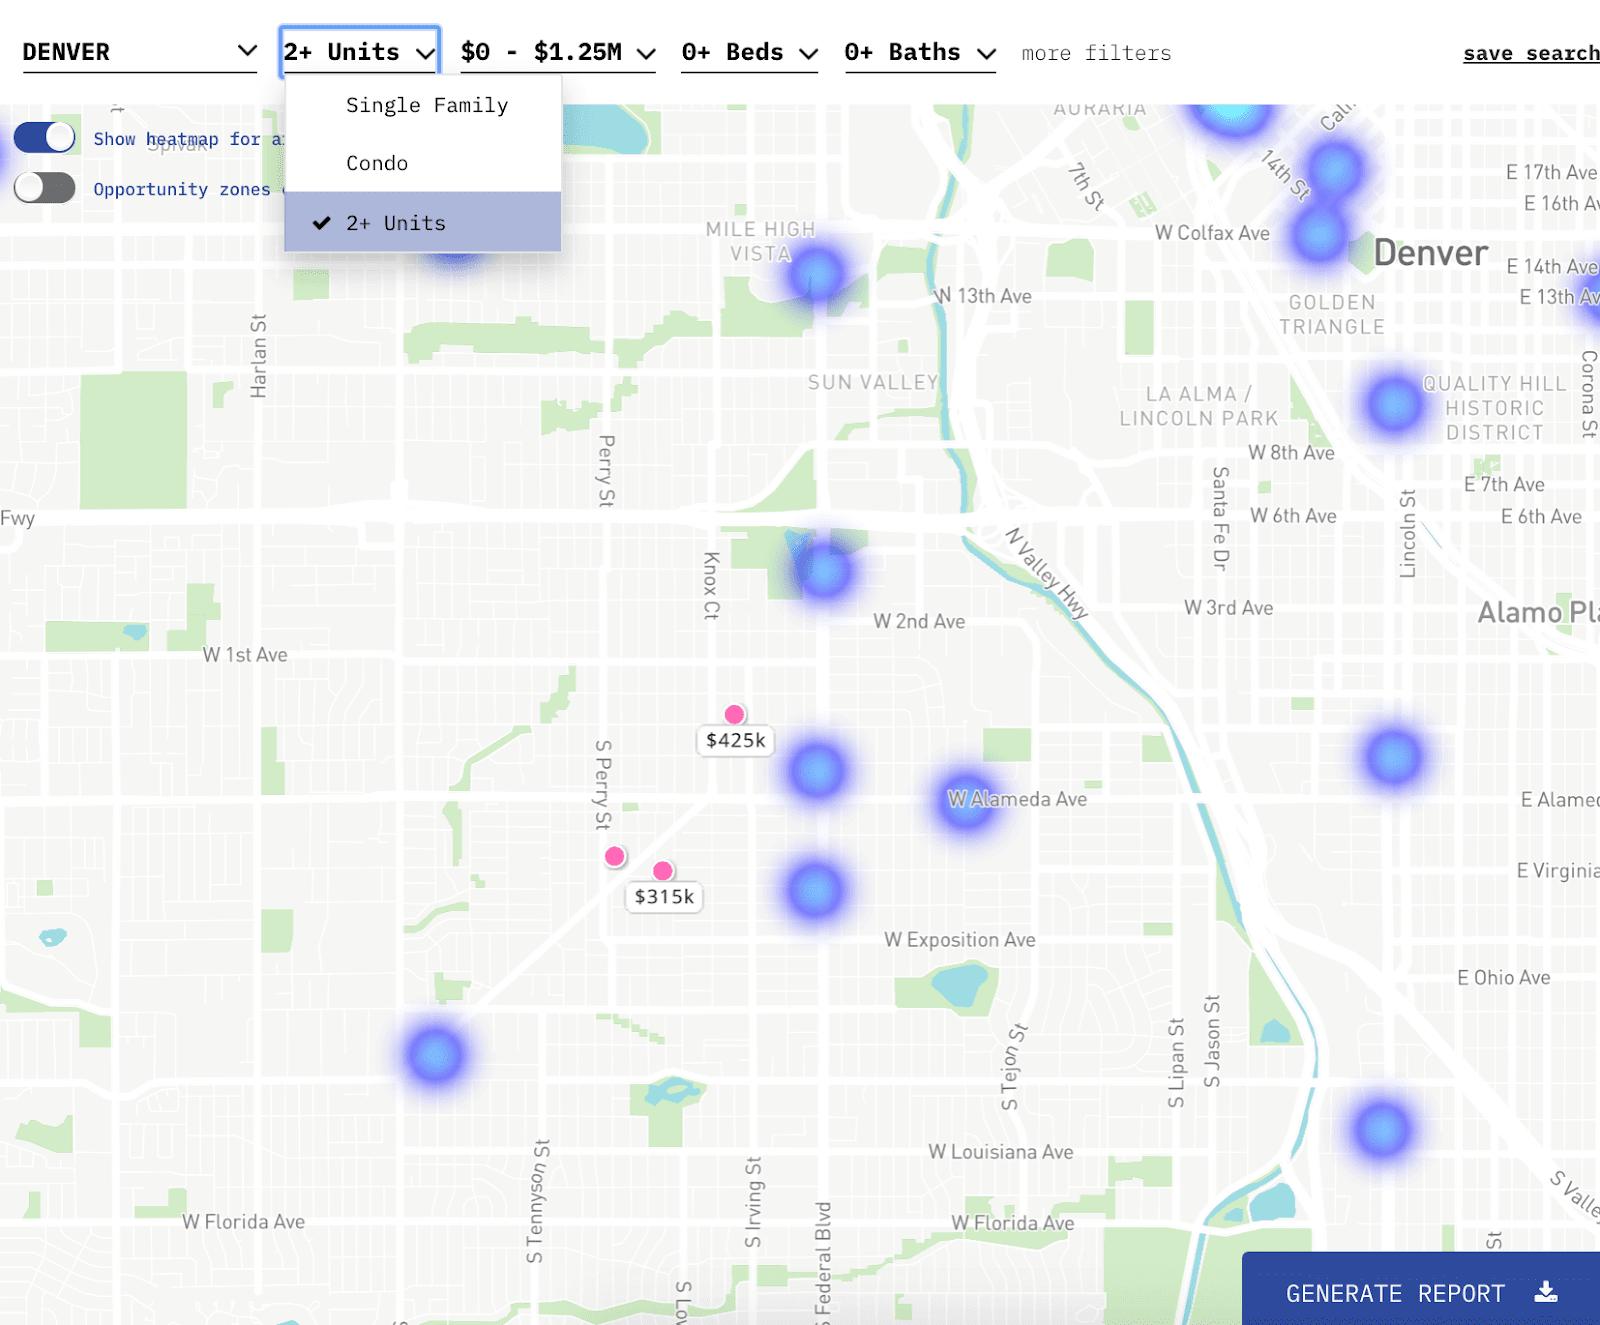 Lofty AI platform showing duplexes for sale in Denver